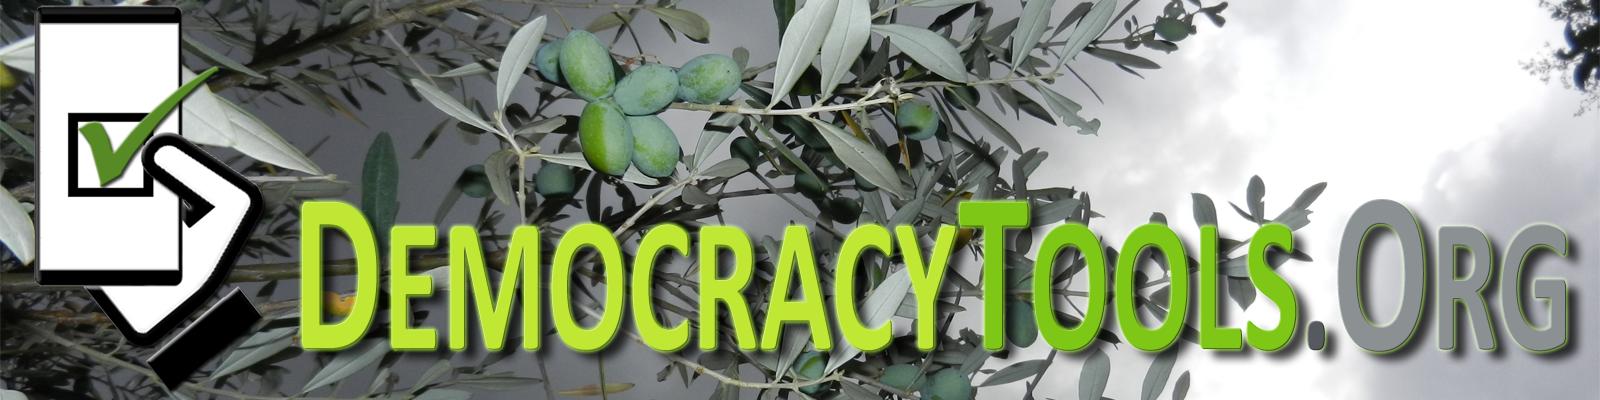 Democracytools.ORG